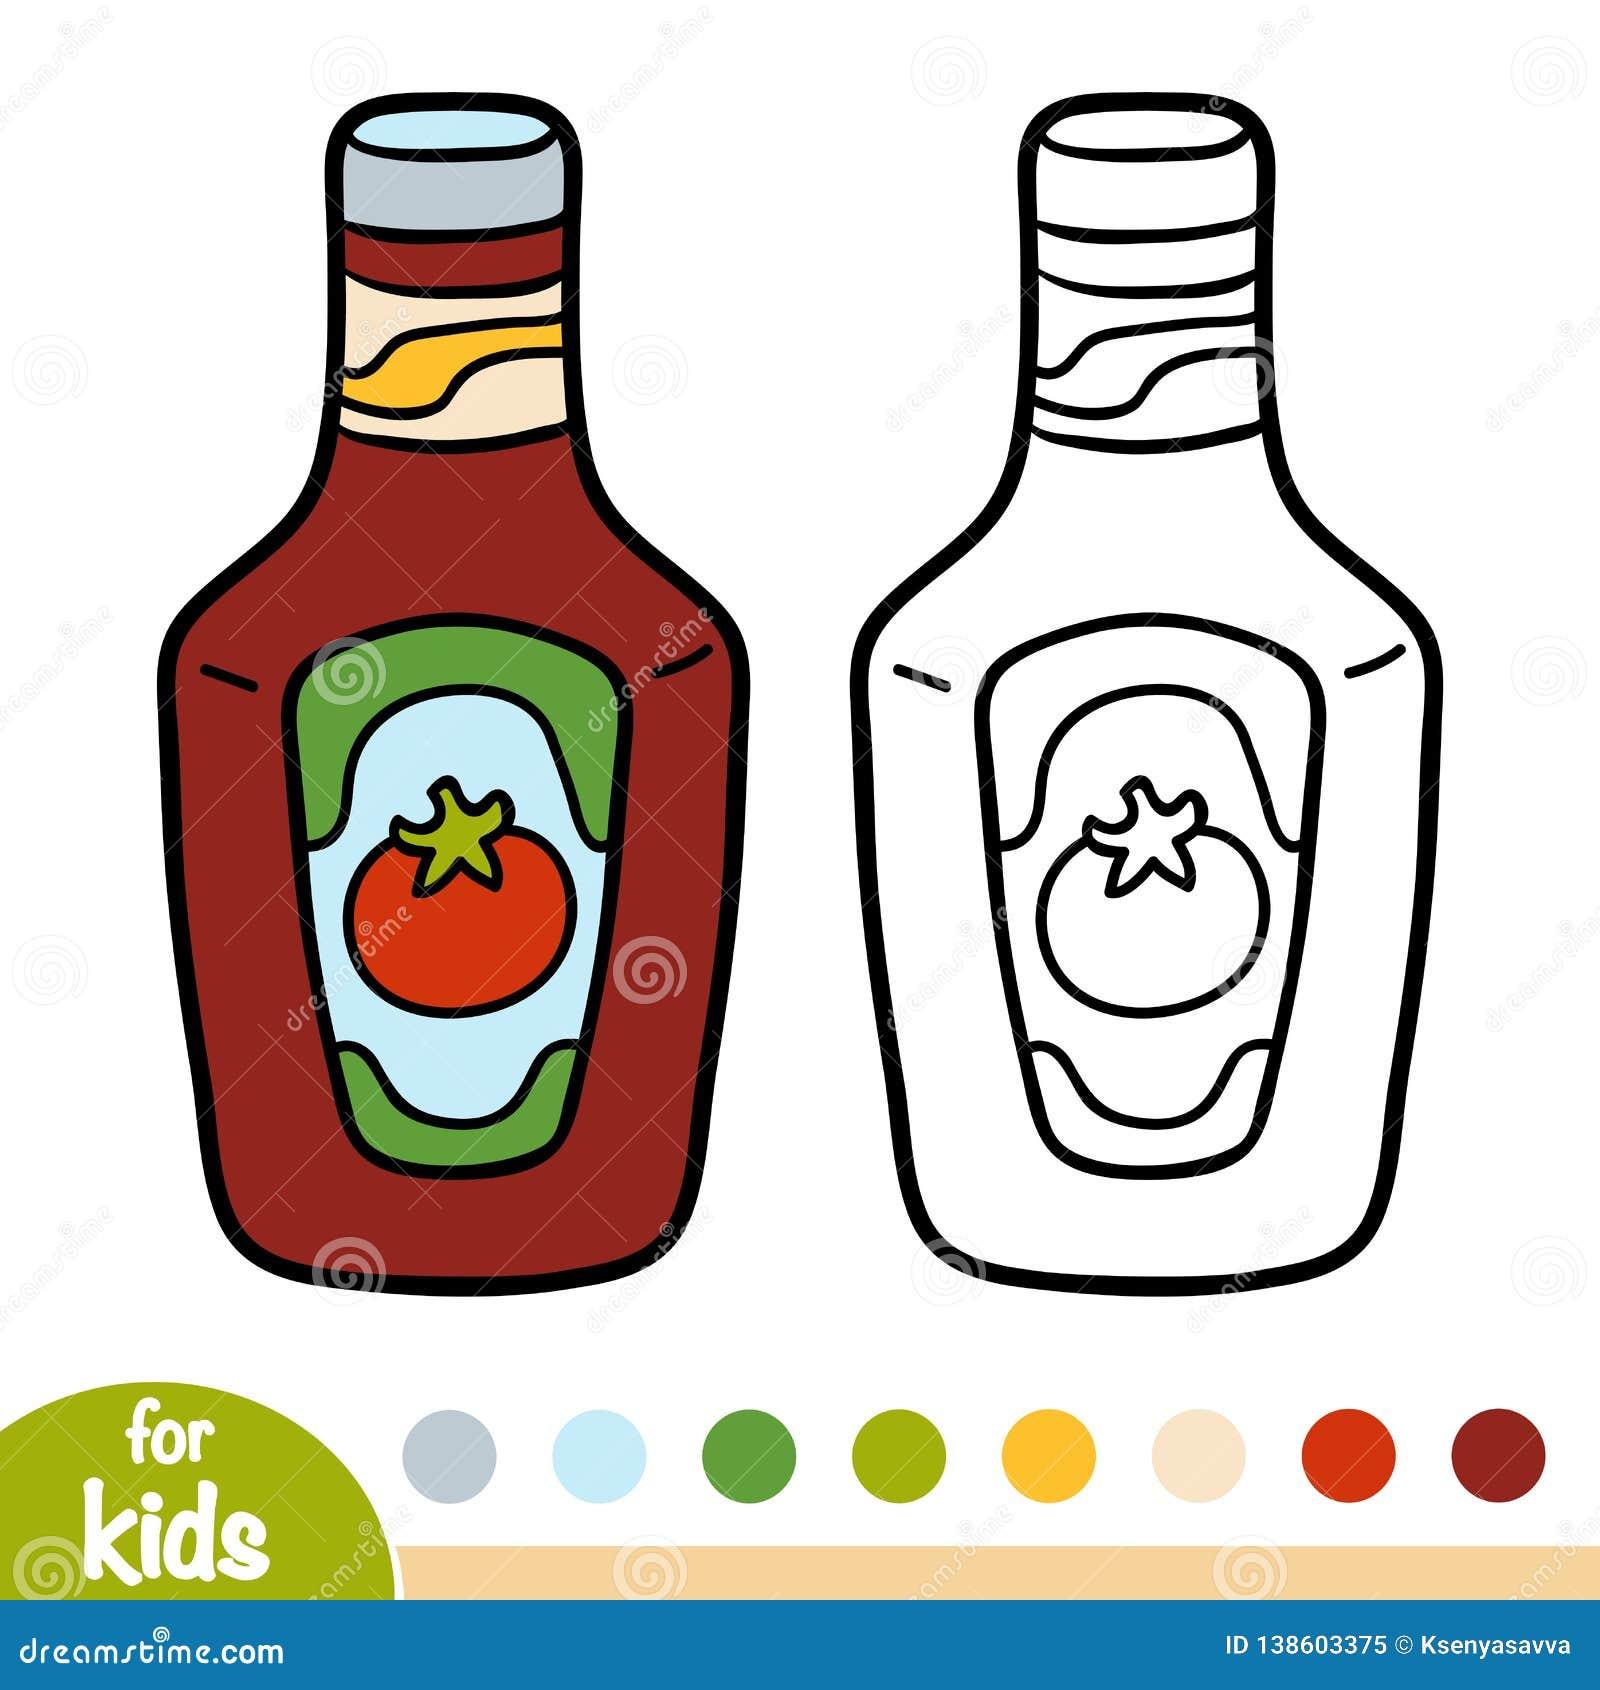 Coloring book, Ketchup pack